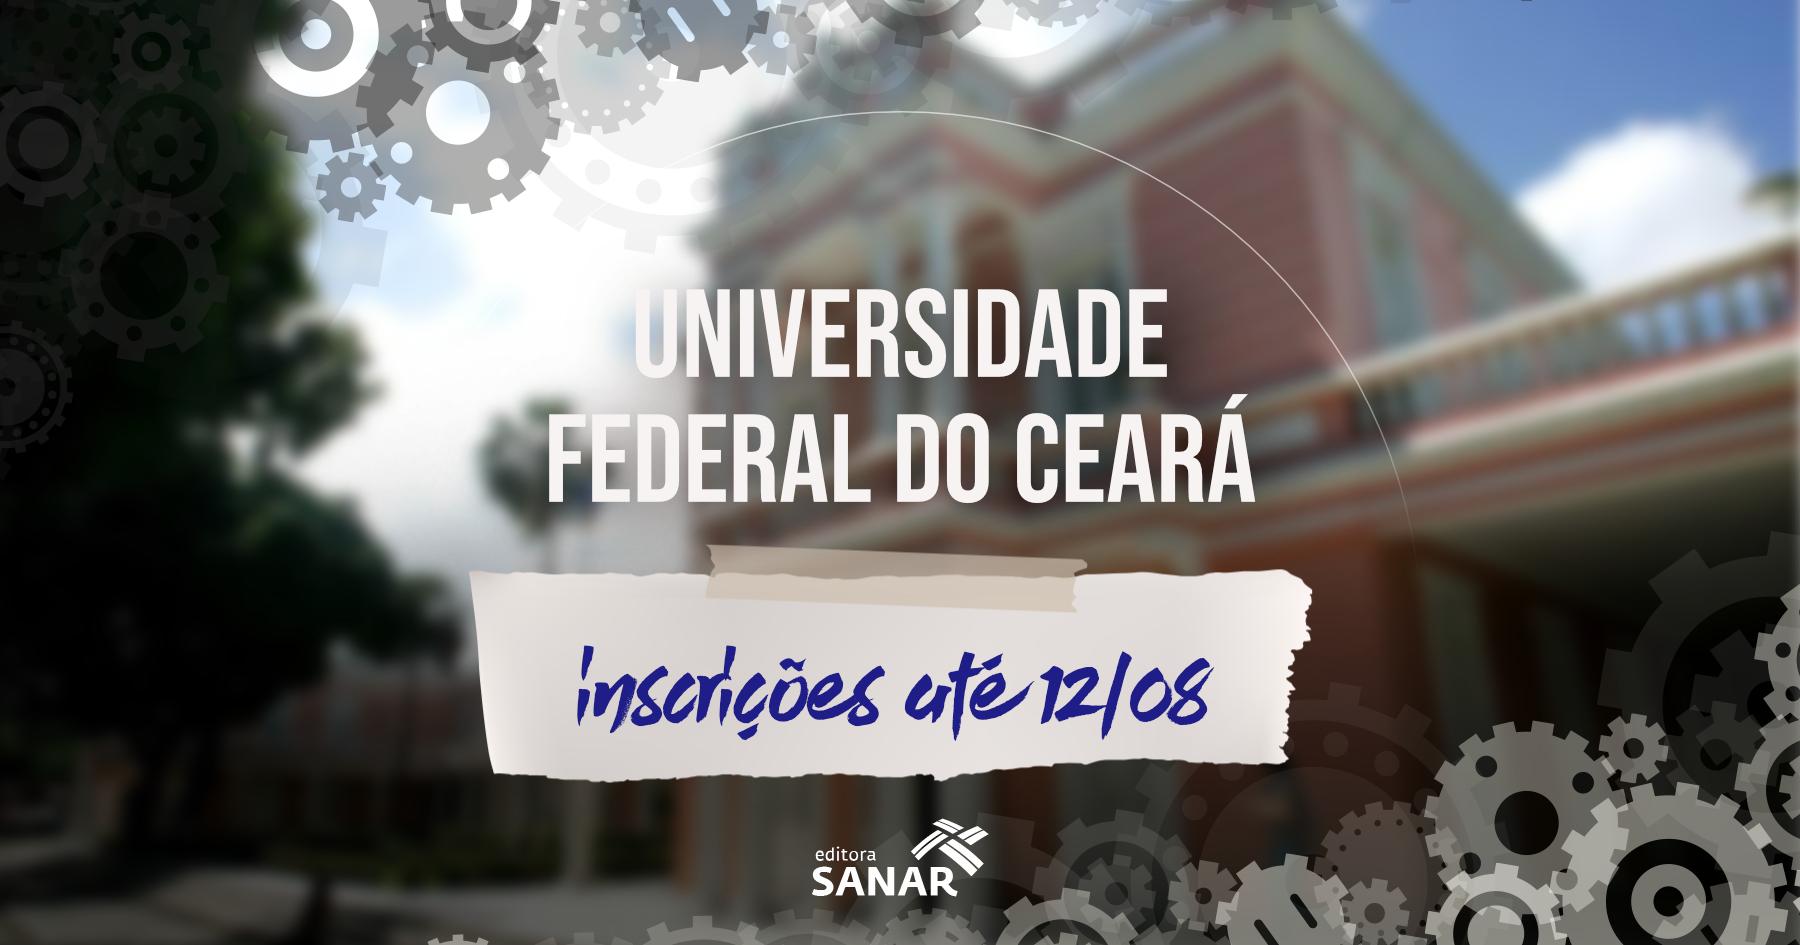 Concurso | Federal do Ceará divulga edital